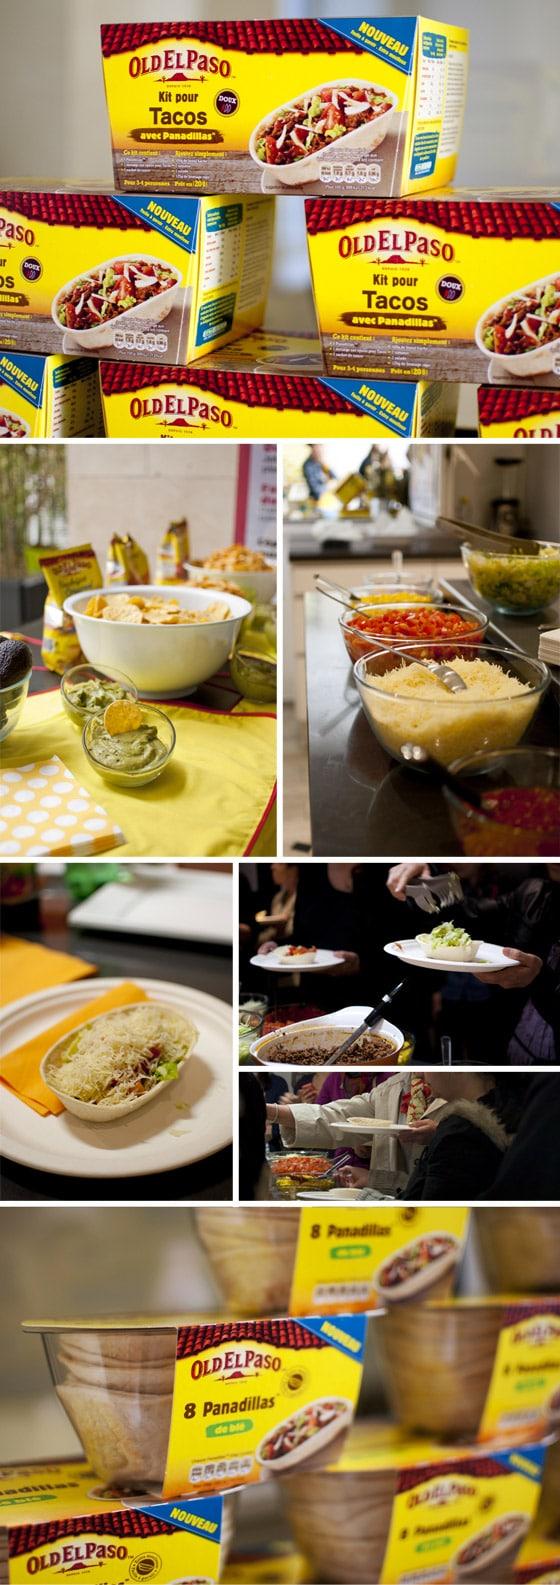 panadillas_oldelpaso_marmiton_cuisineouverte_stellacuisine